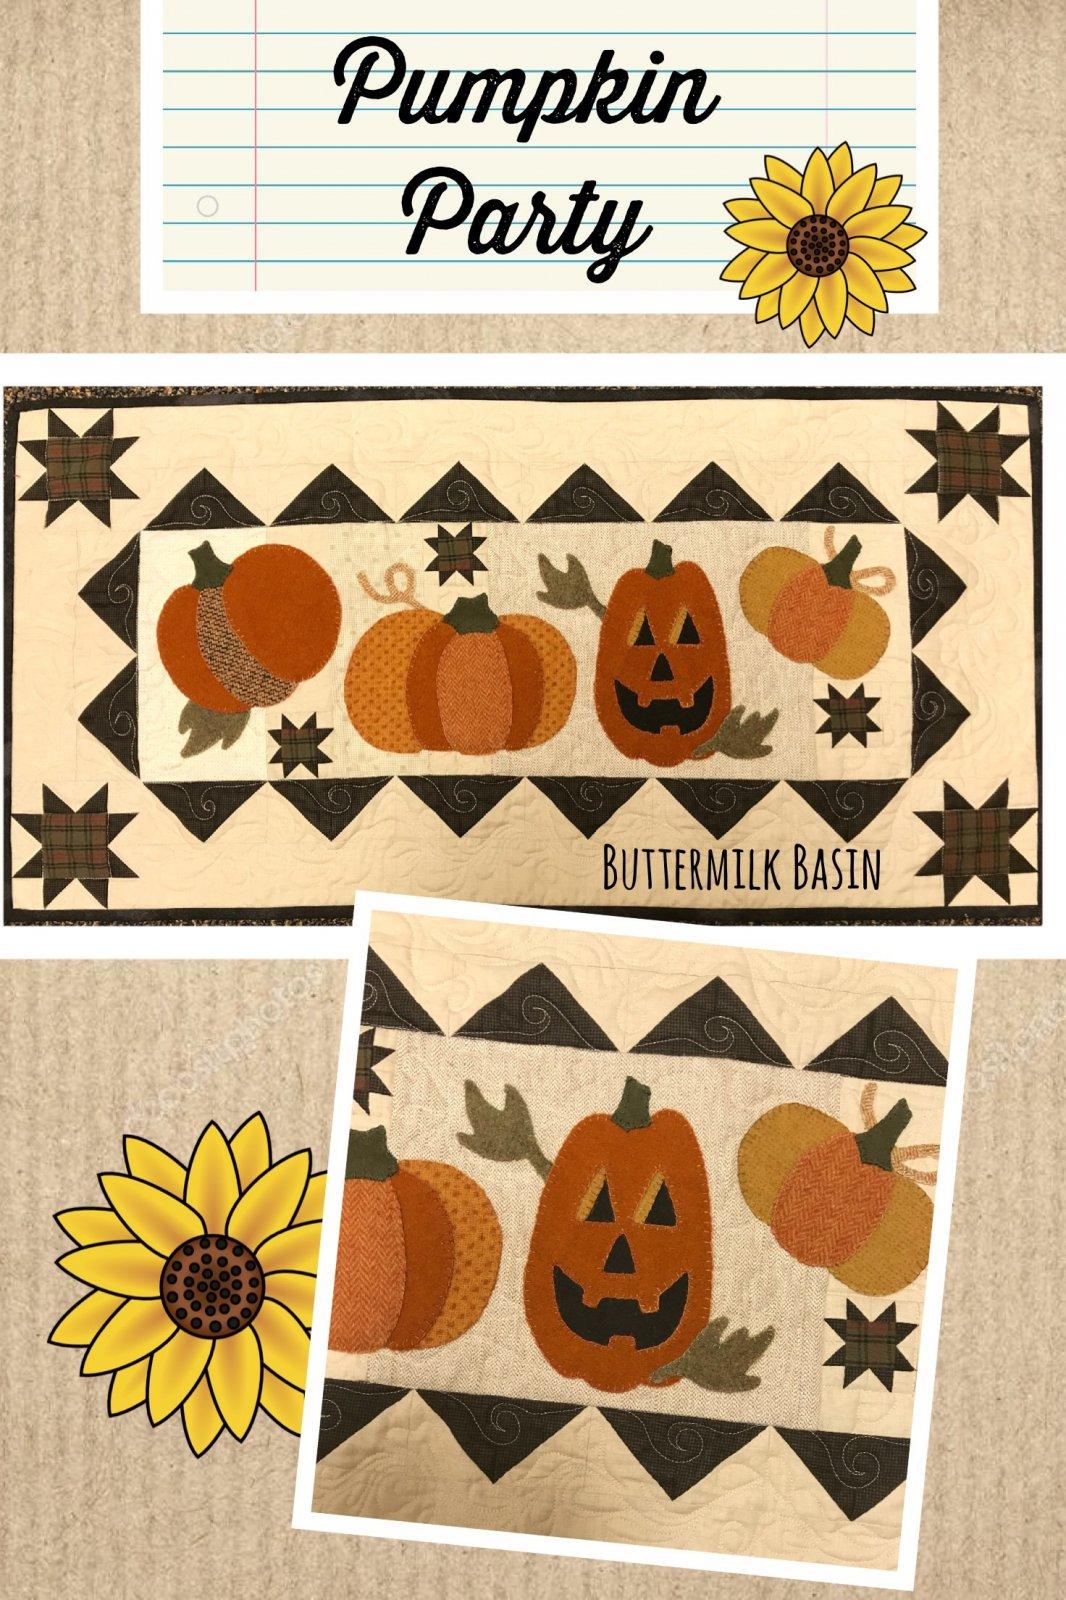 Pumpkin Party Runner WOOL Kit & Pattern